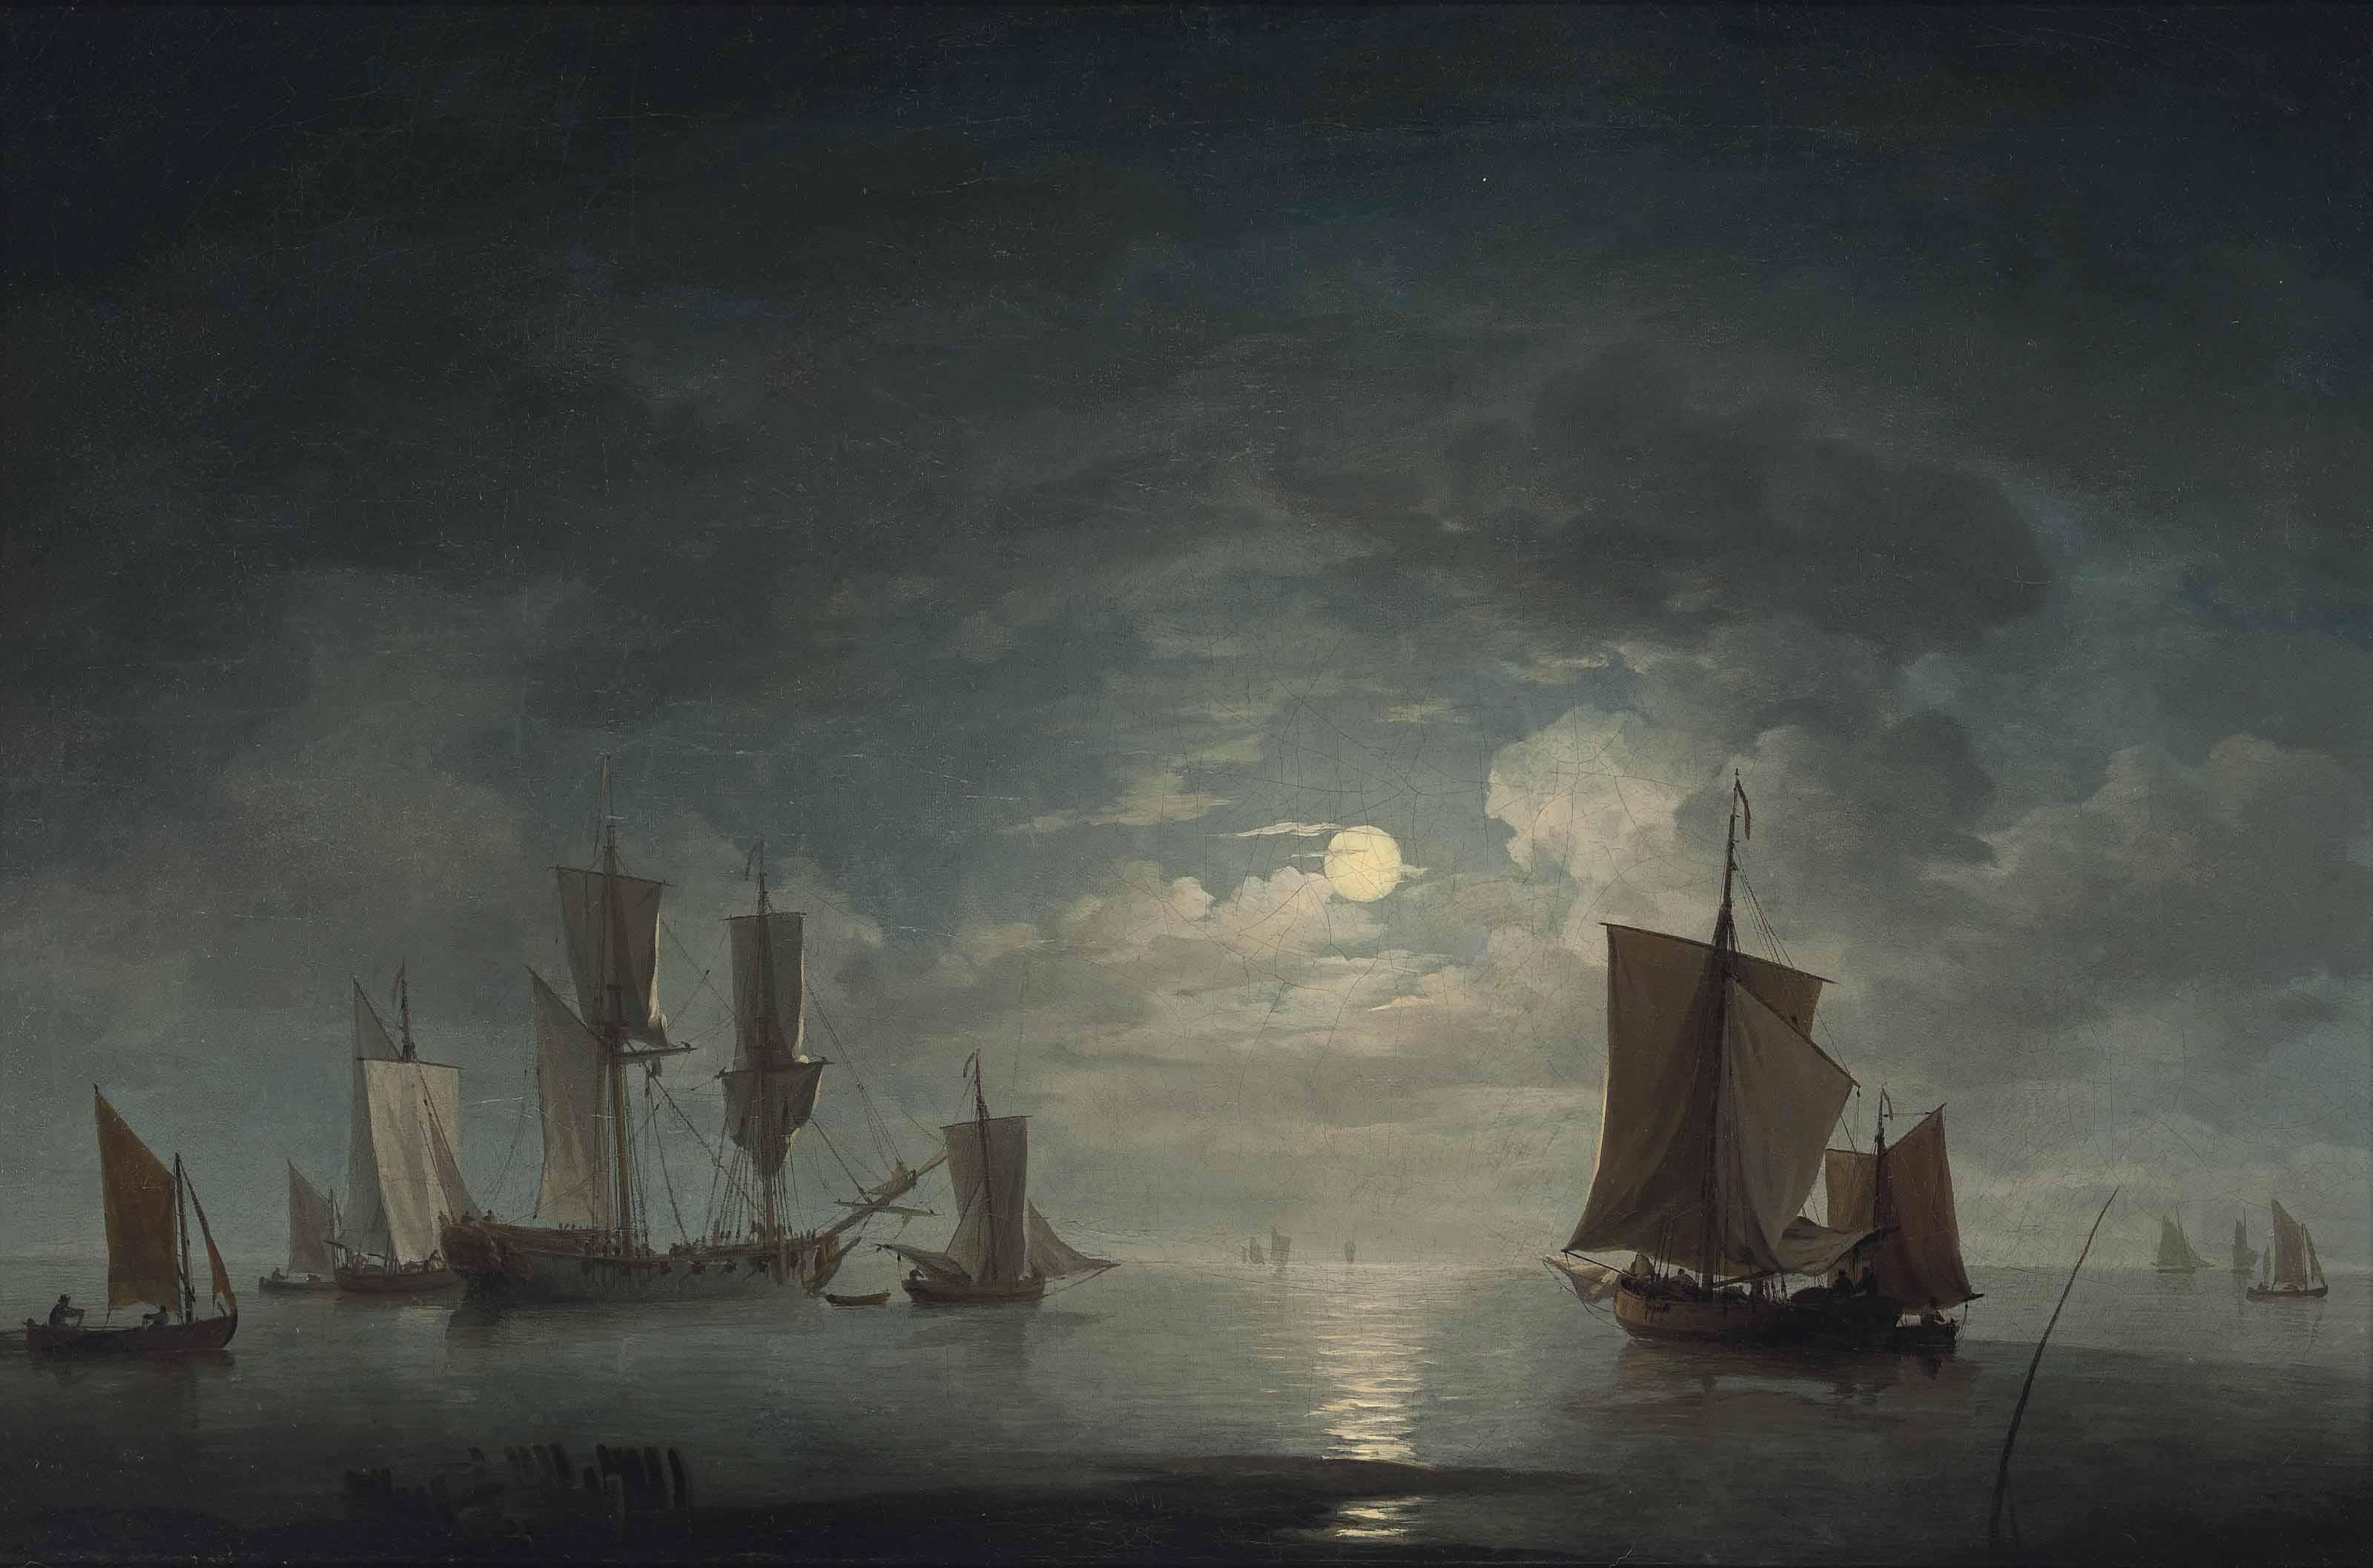 An English merchant brig and coastal craft becalmed by moonlight